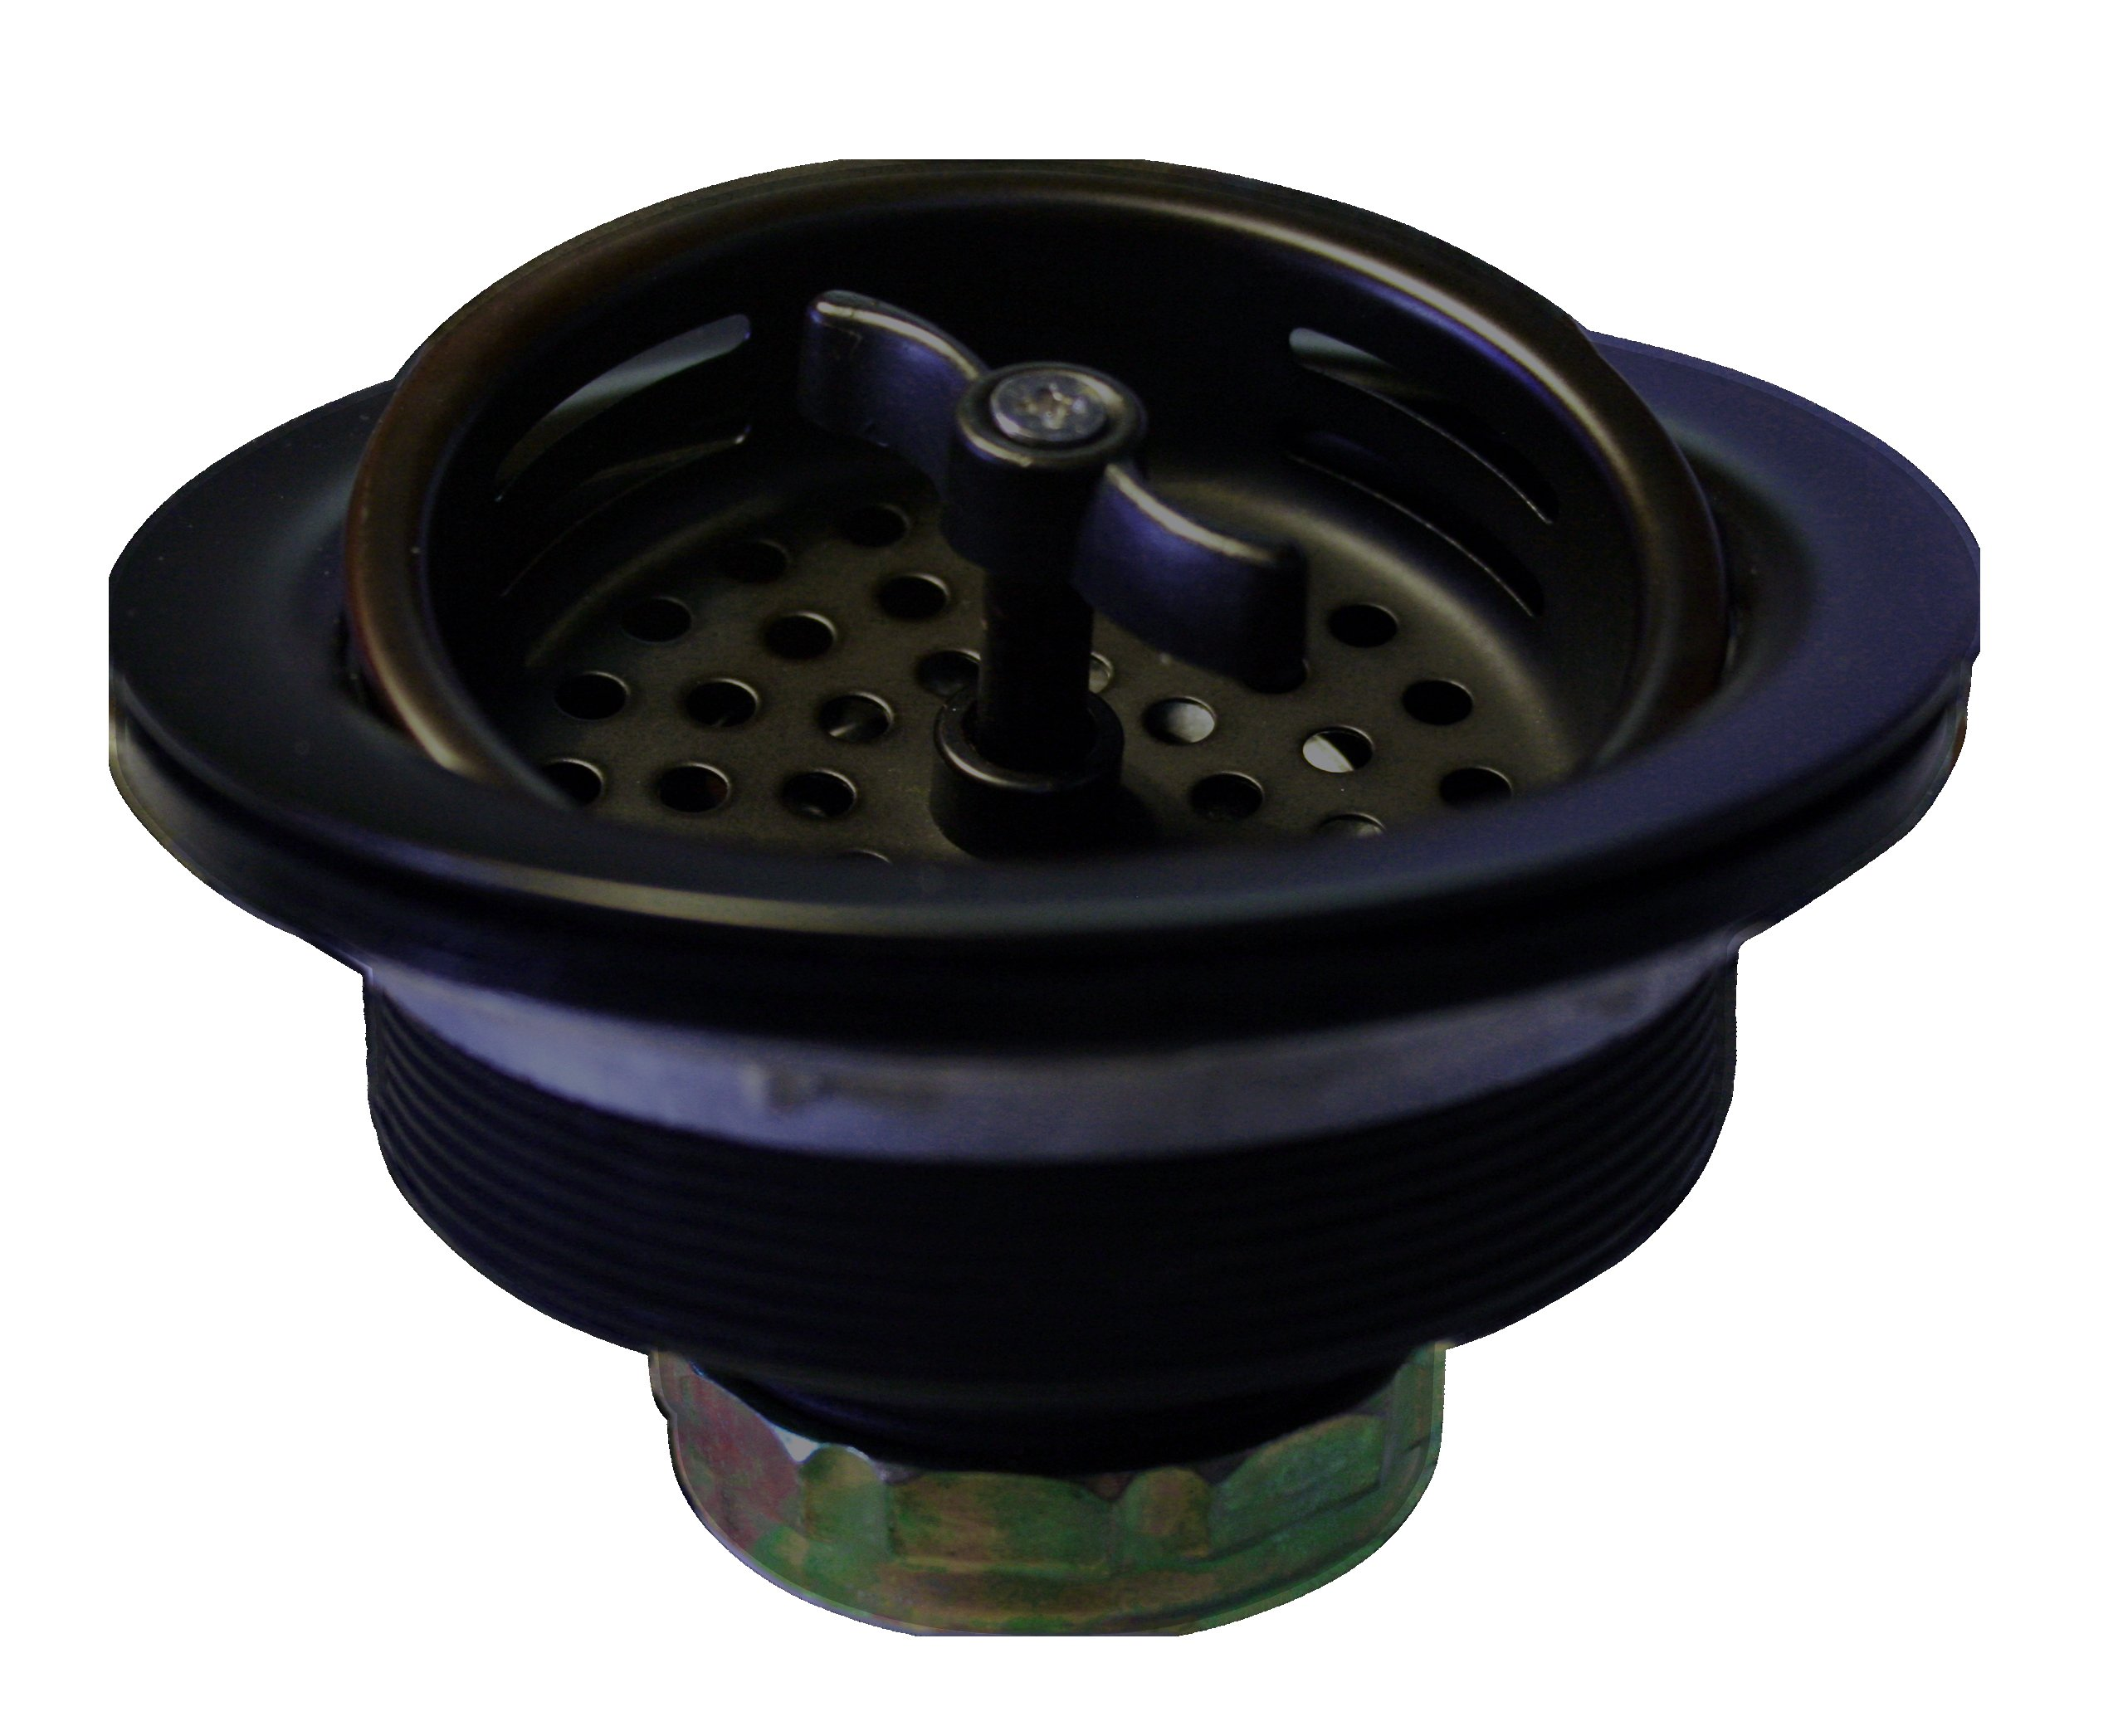 Westbrass Wing Nut Style Large Kitchen Sink Basket Strainer, Matte Black, D213-62